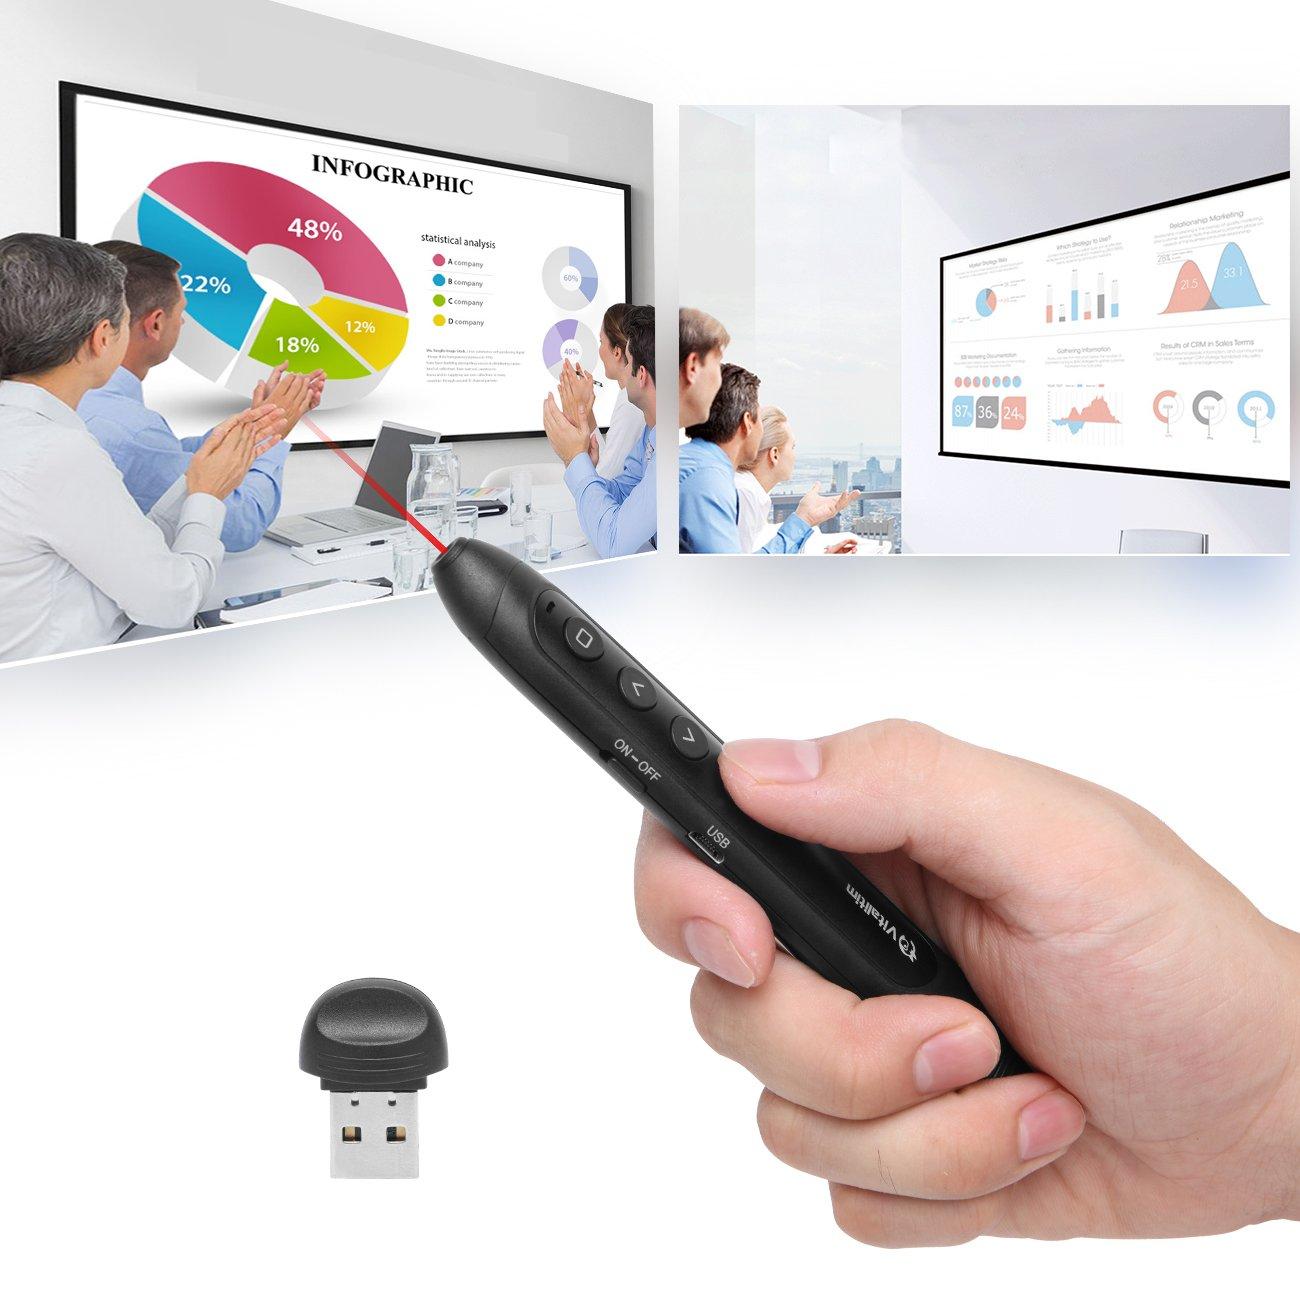 Vitalitim Rechargeable Wireless Presenter, 2.4Ghz Wireless USB Powerpoint PPT Presentation Pointer Remote Control Clicker Pen, Support Hyperlink (BLack)